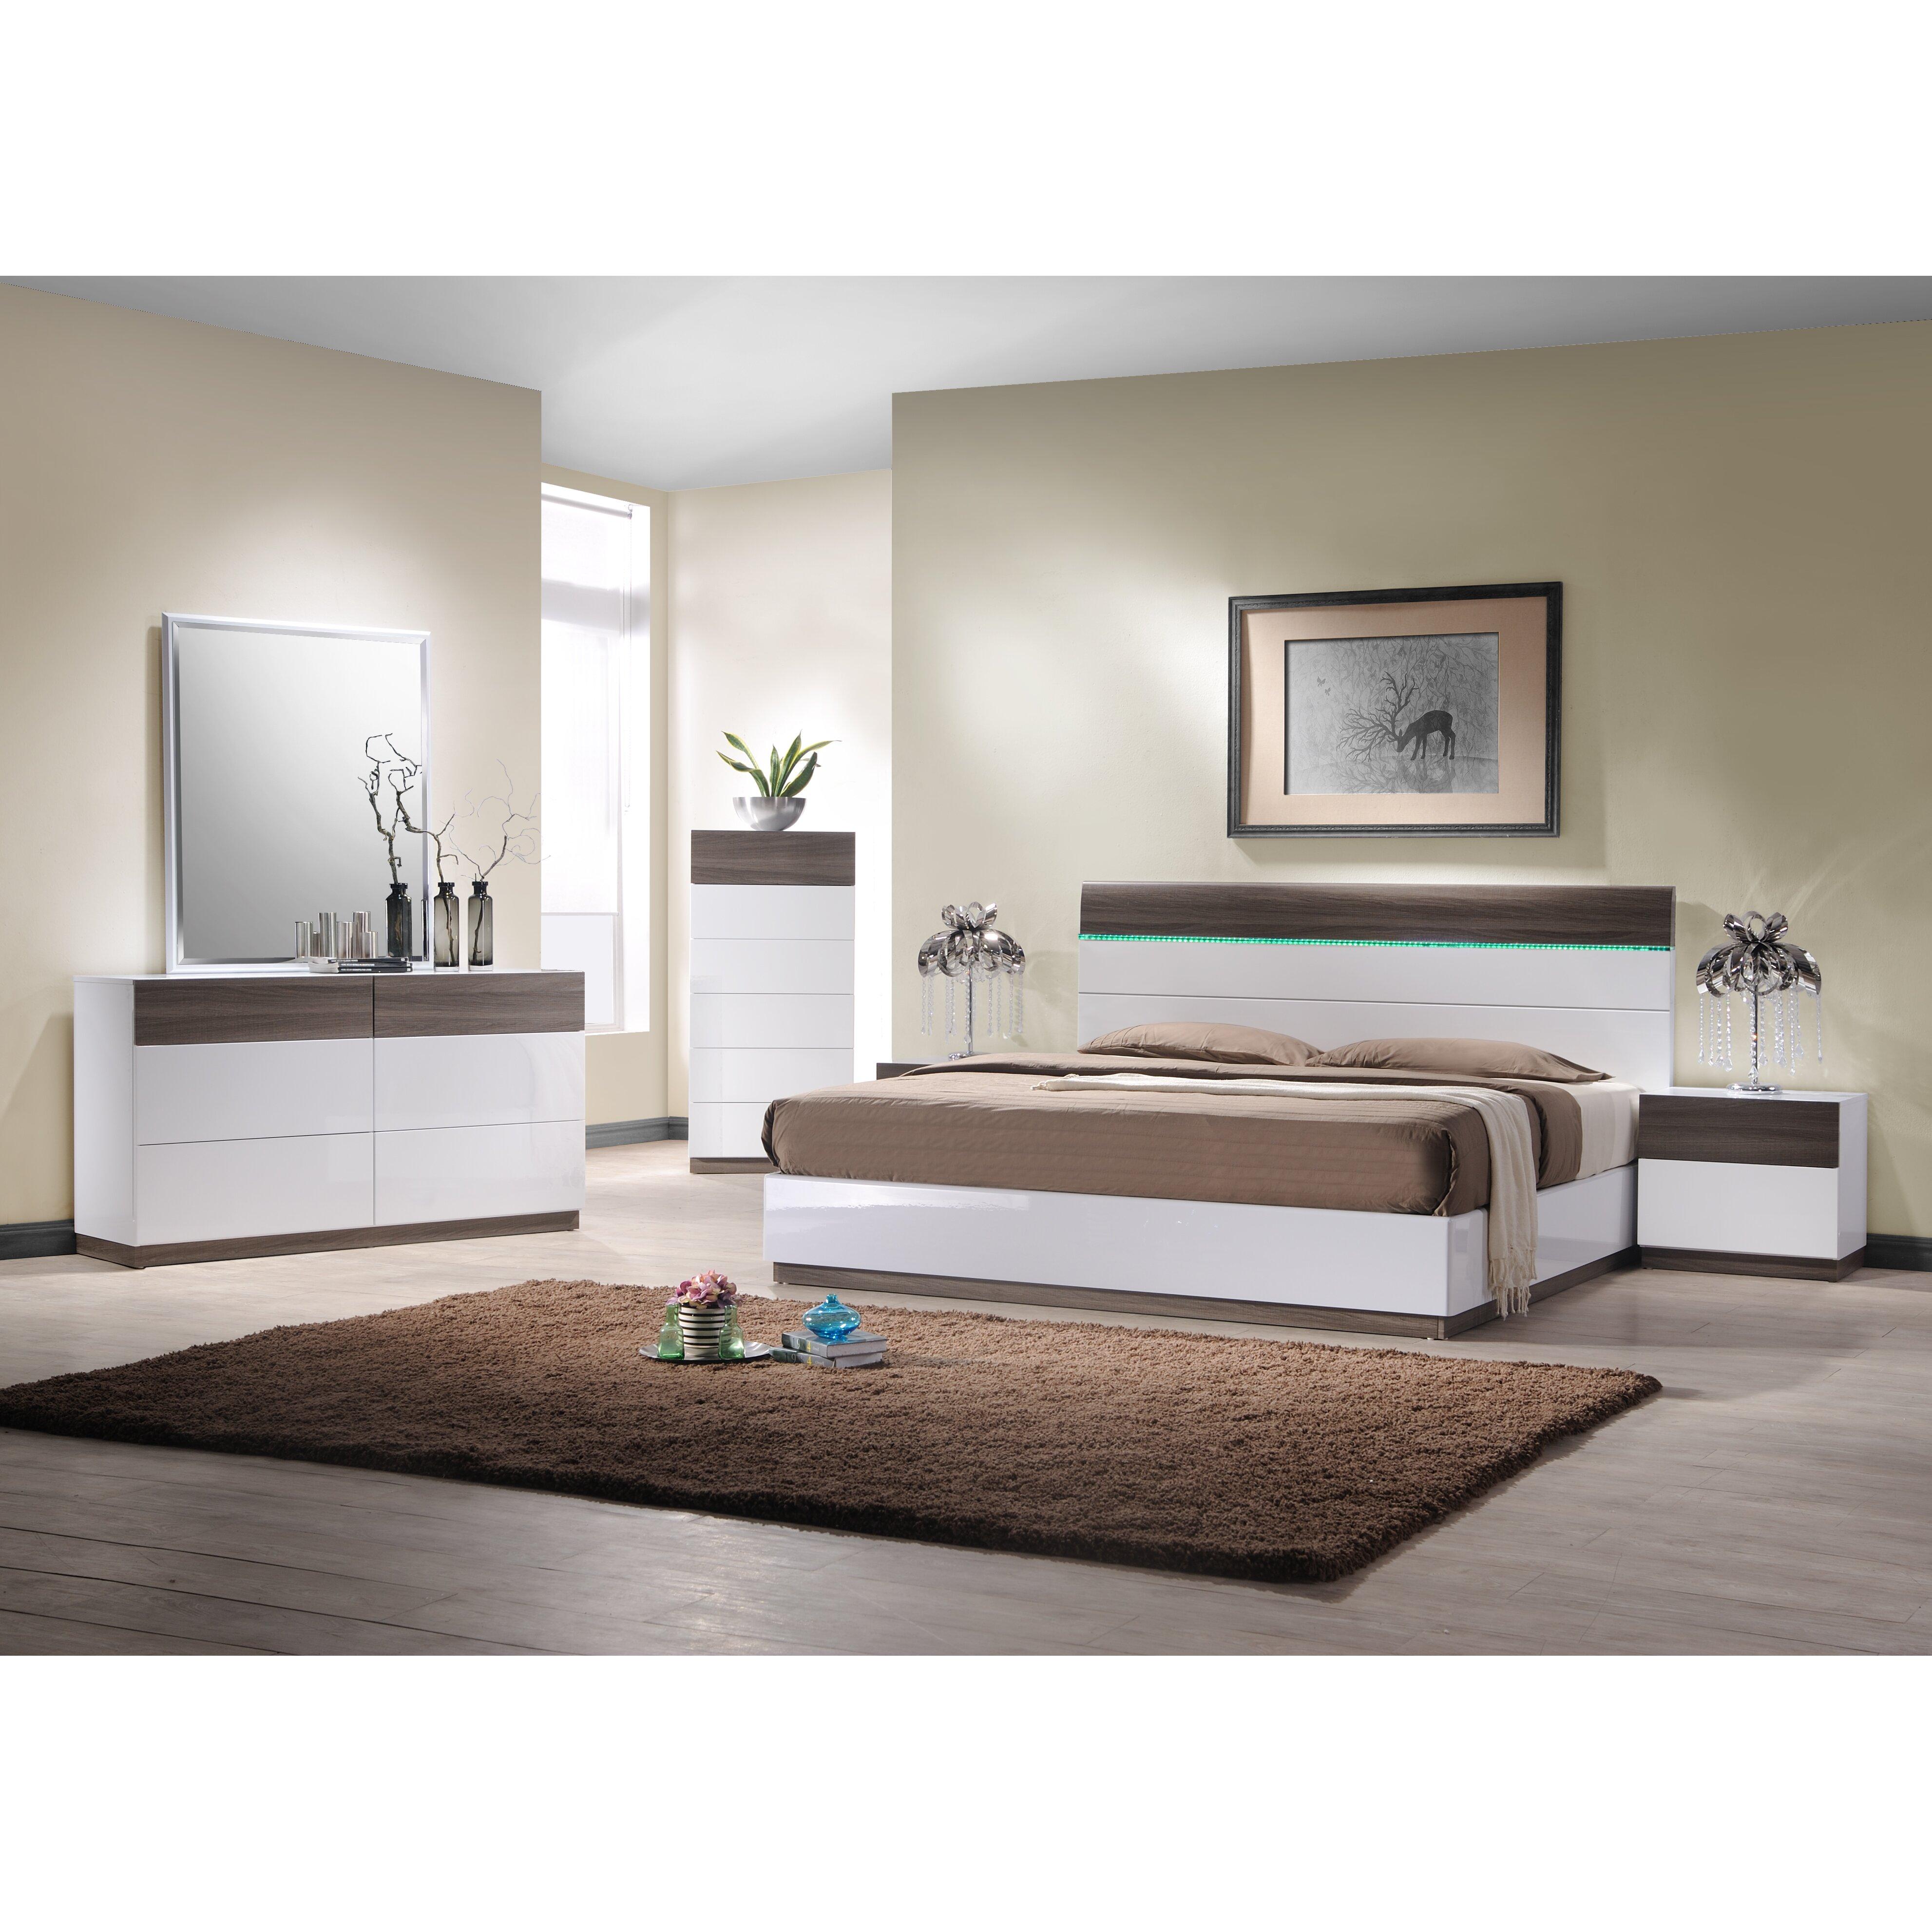 J M Furniture Sanremo Drawer Nightstand Reviews Wayfair